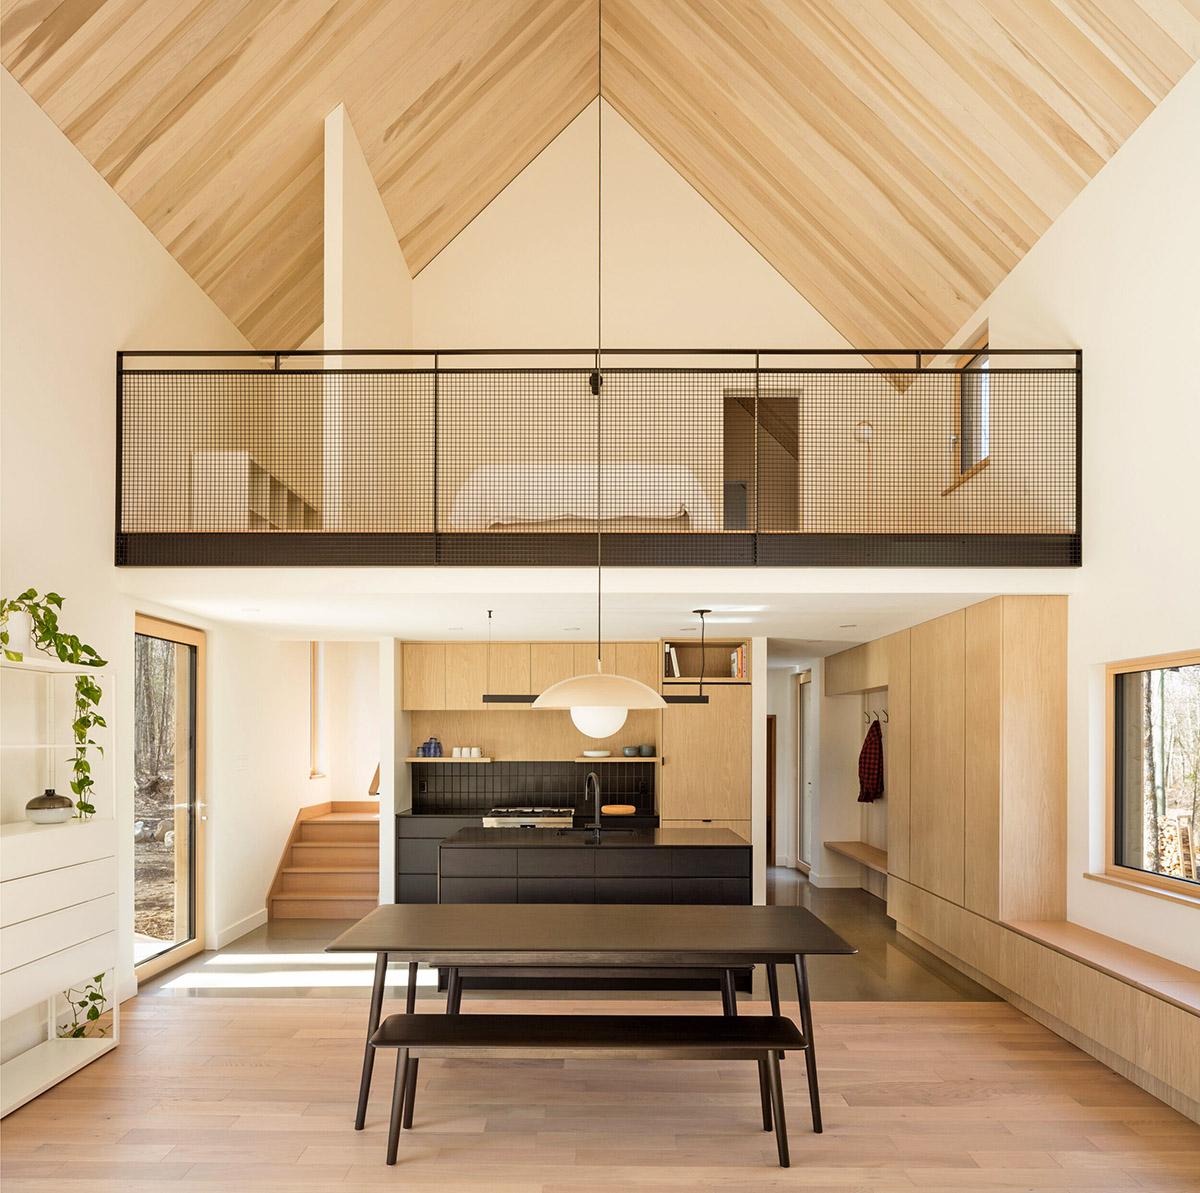 Pic-Bois-Ravi-Handa-Architect-Maxime-Brouillet-01